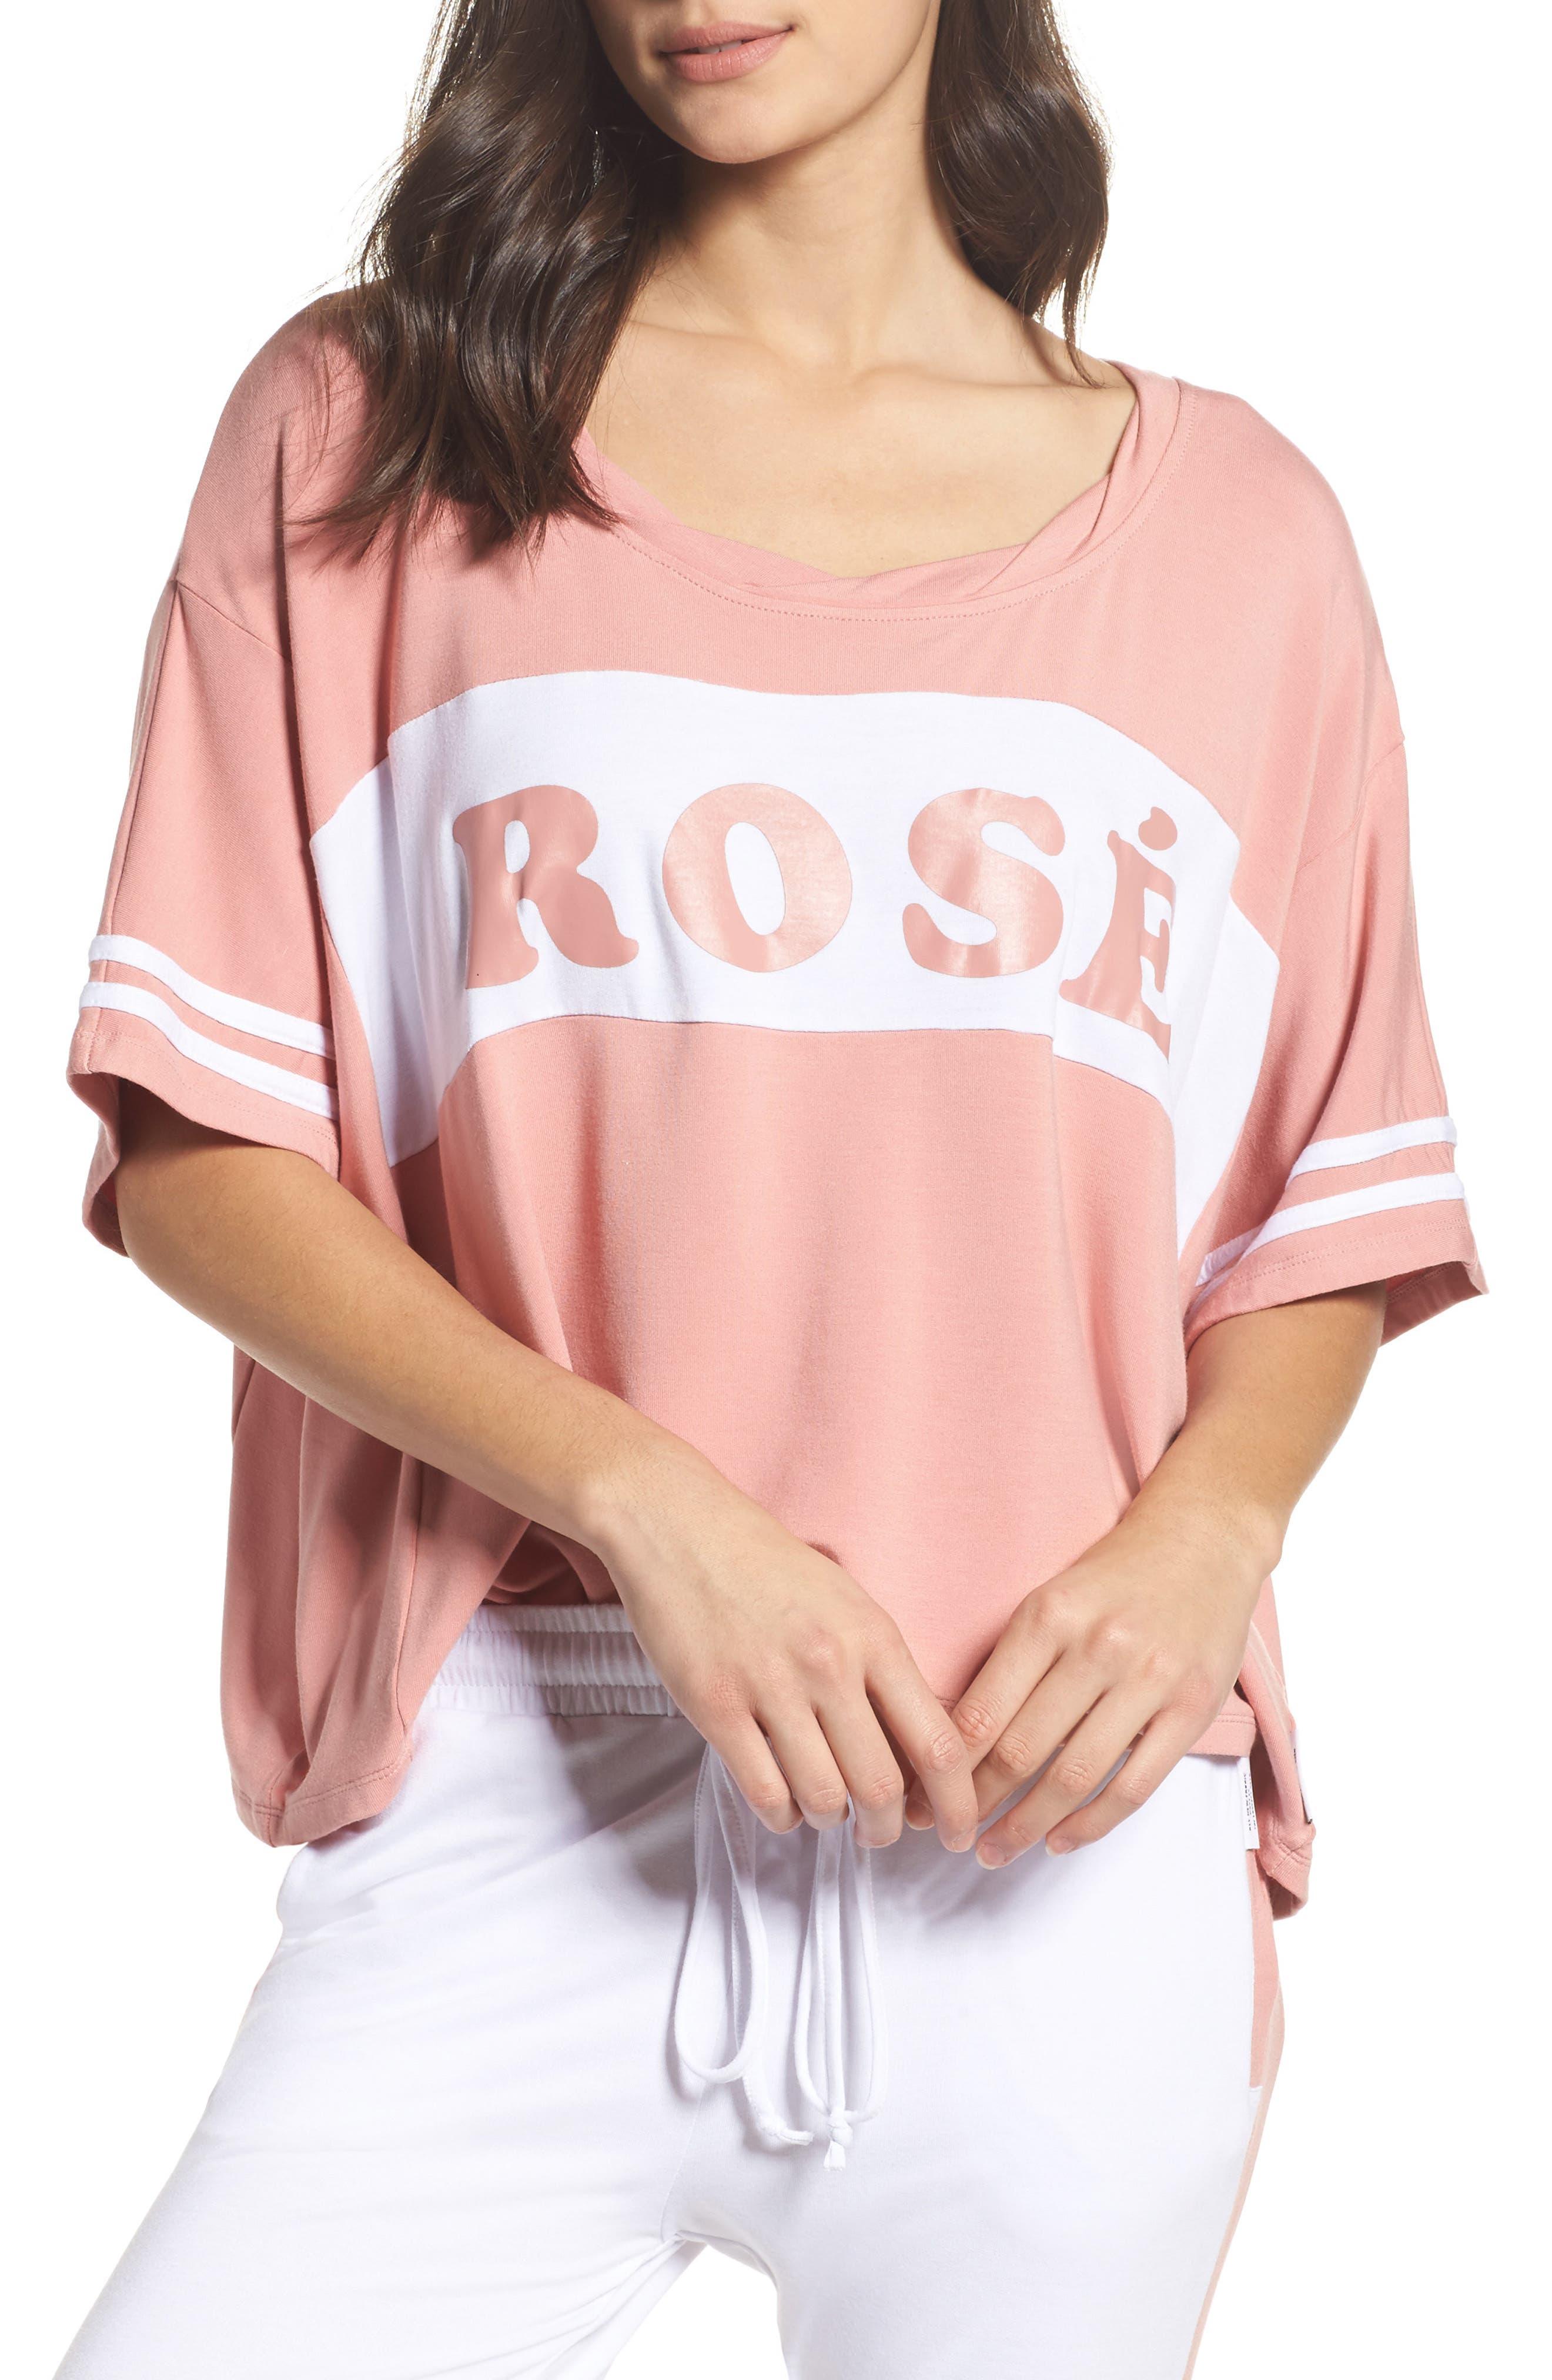 Main Image - The Laundry Room Team Rosé Baggy Tee